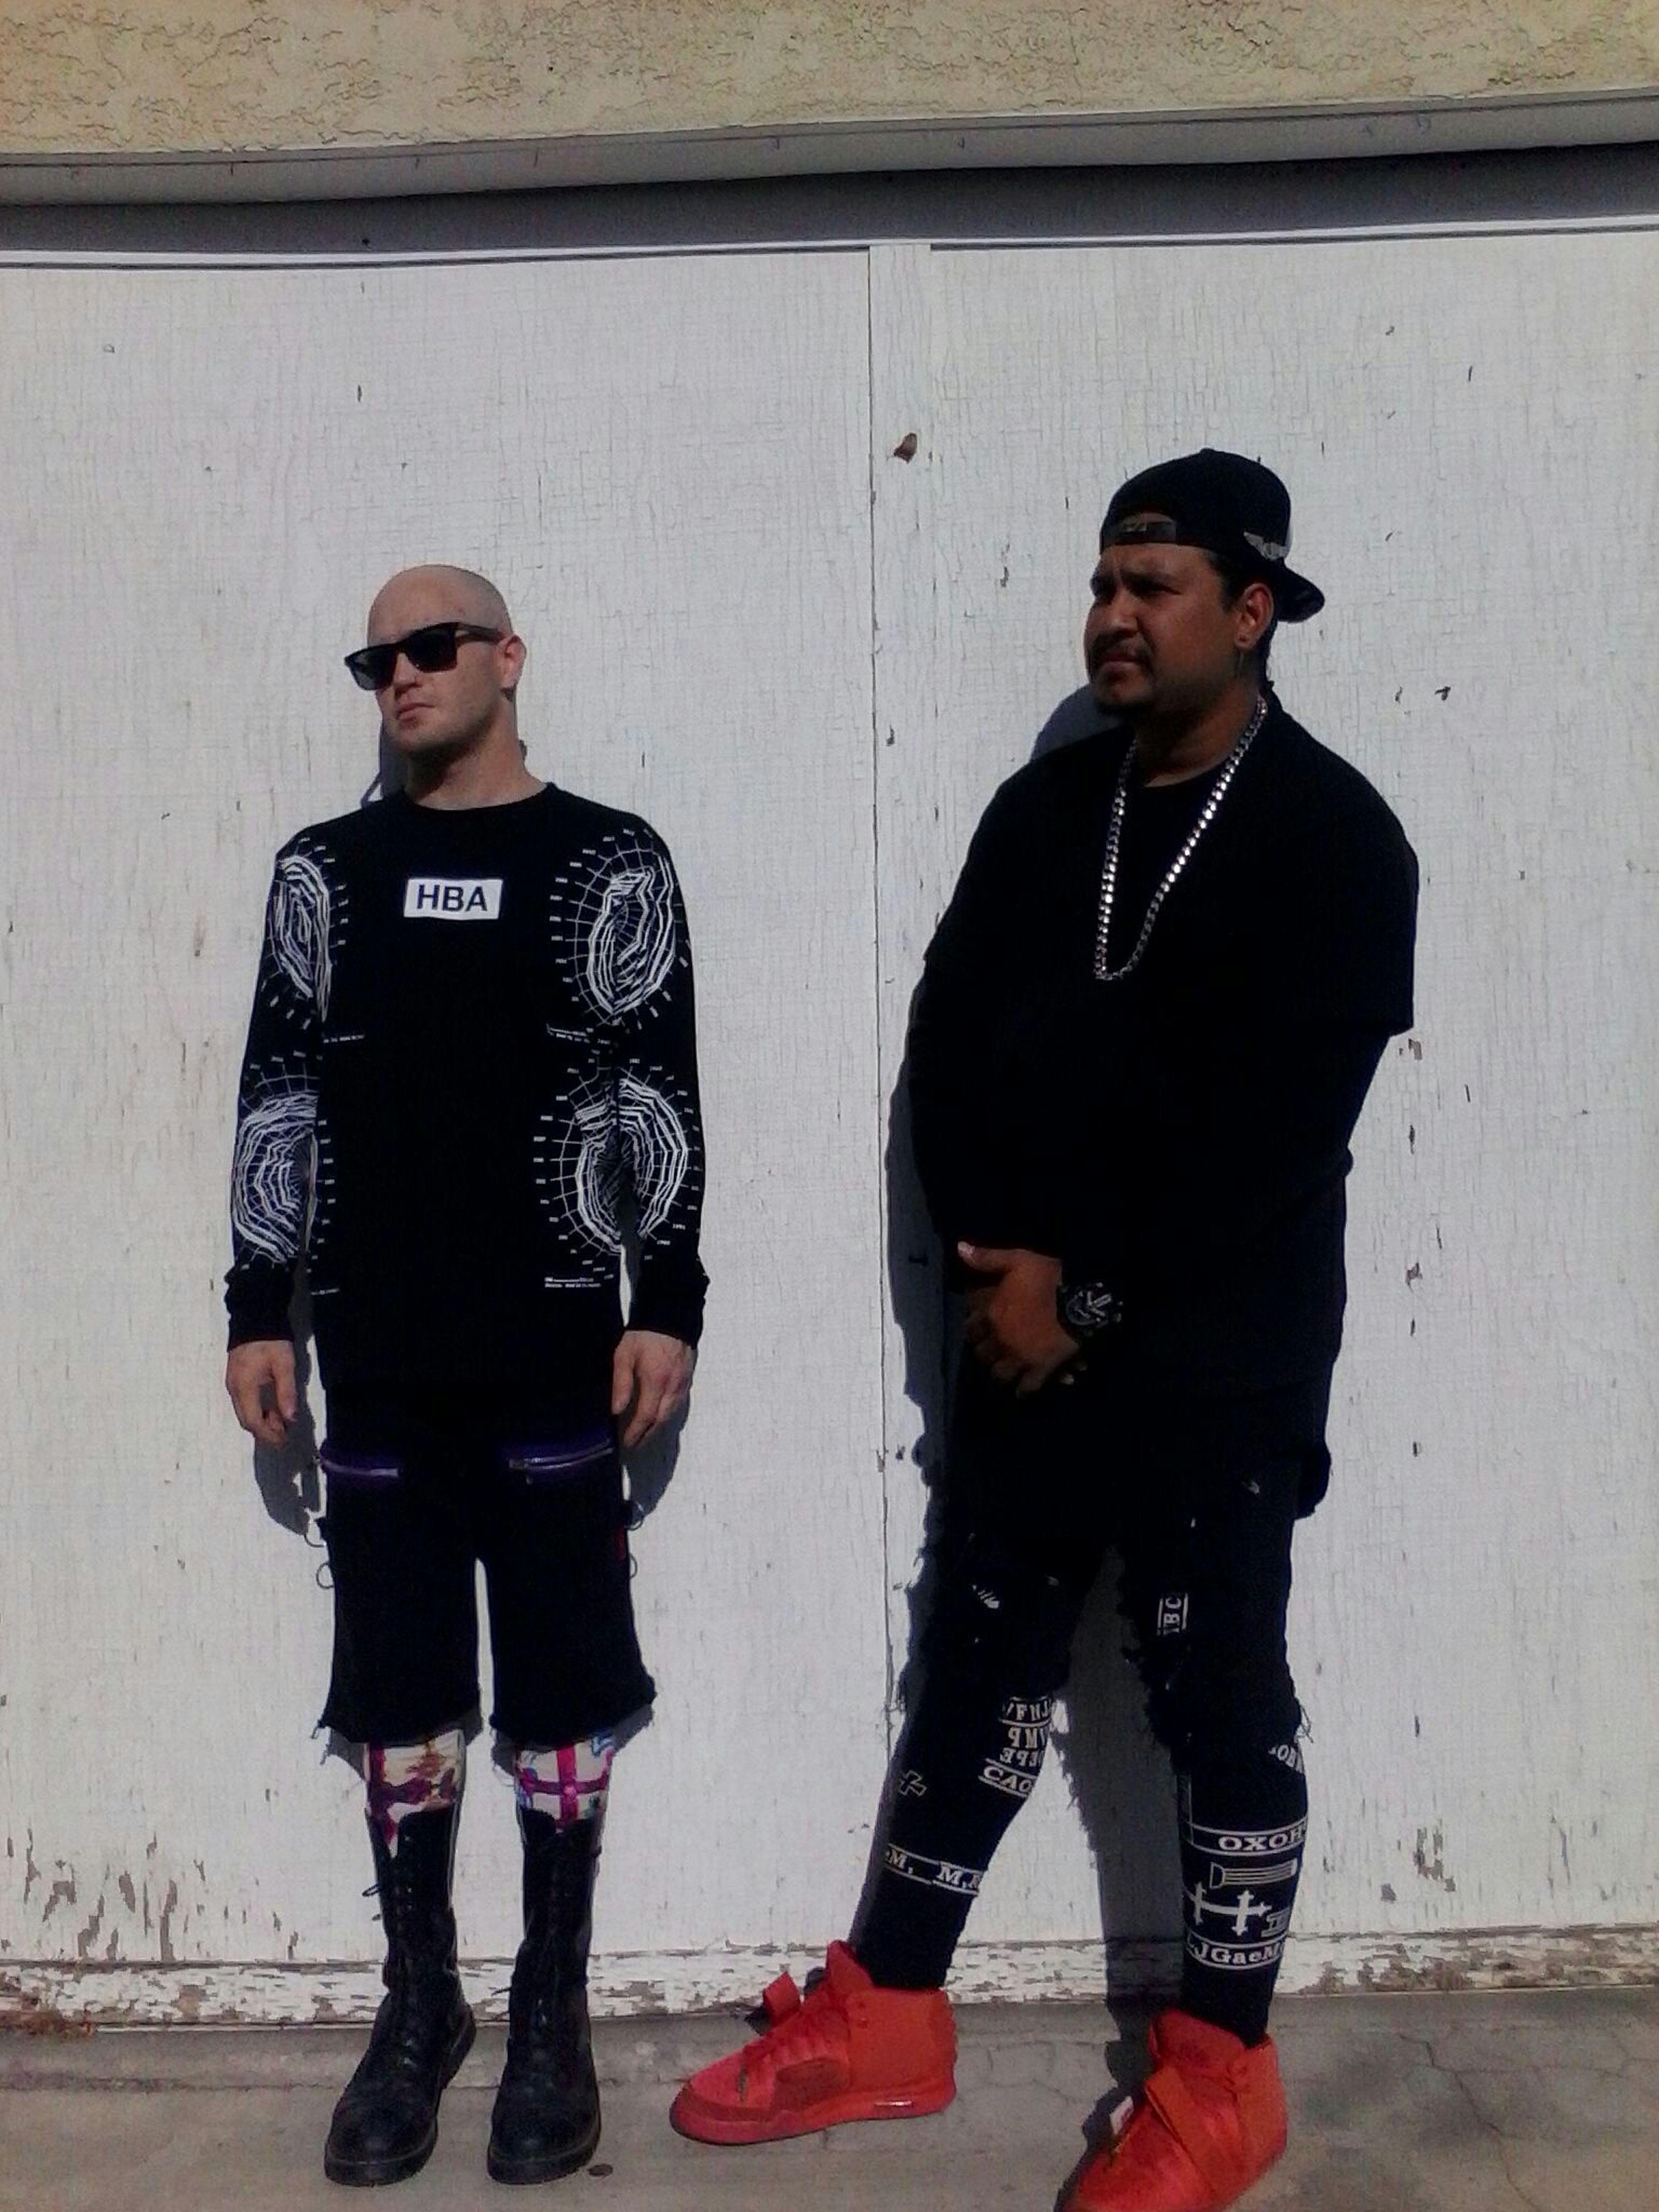 Street Goth Streetgoth Hba Fashion Industrial Poet Of Black Shane Oliver Pyrex Off White